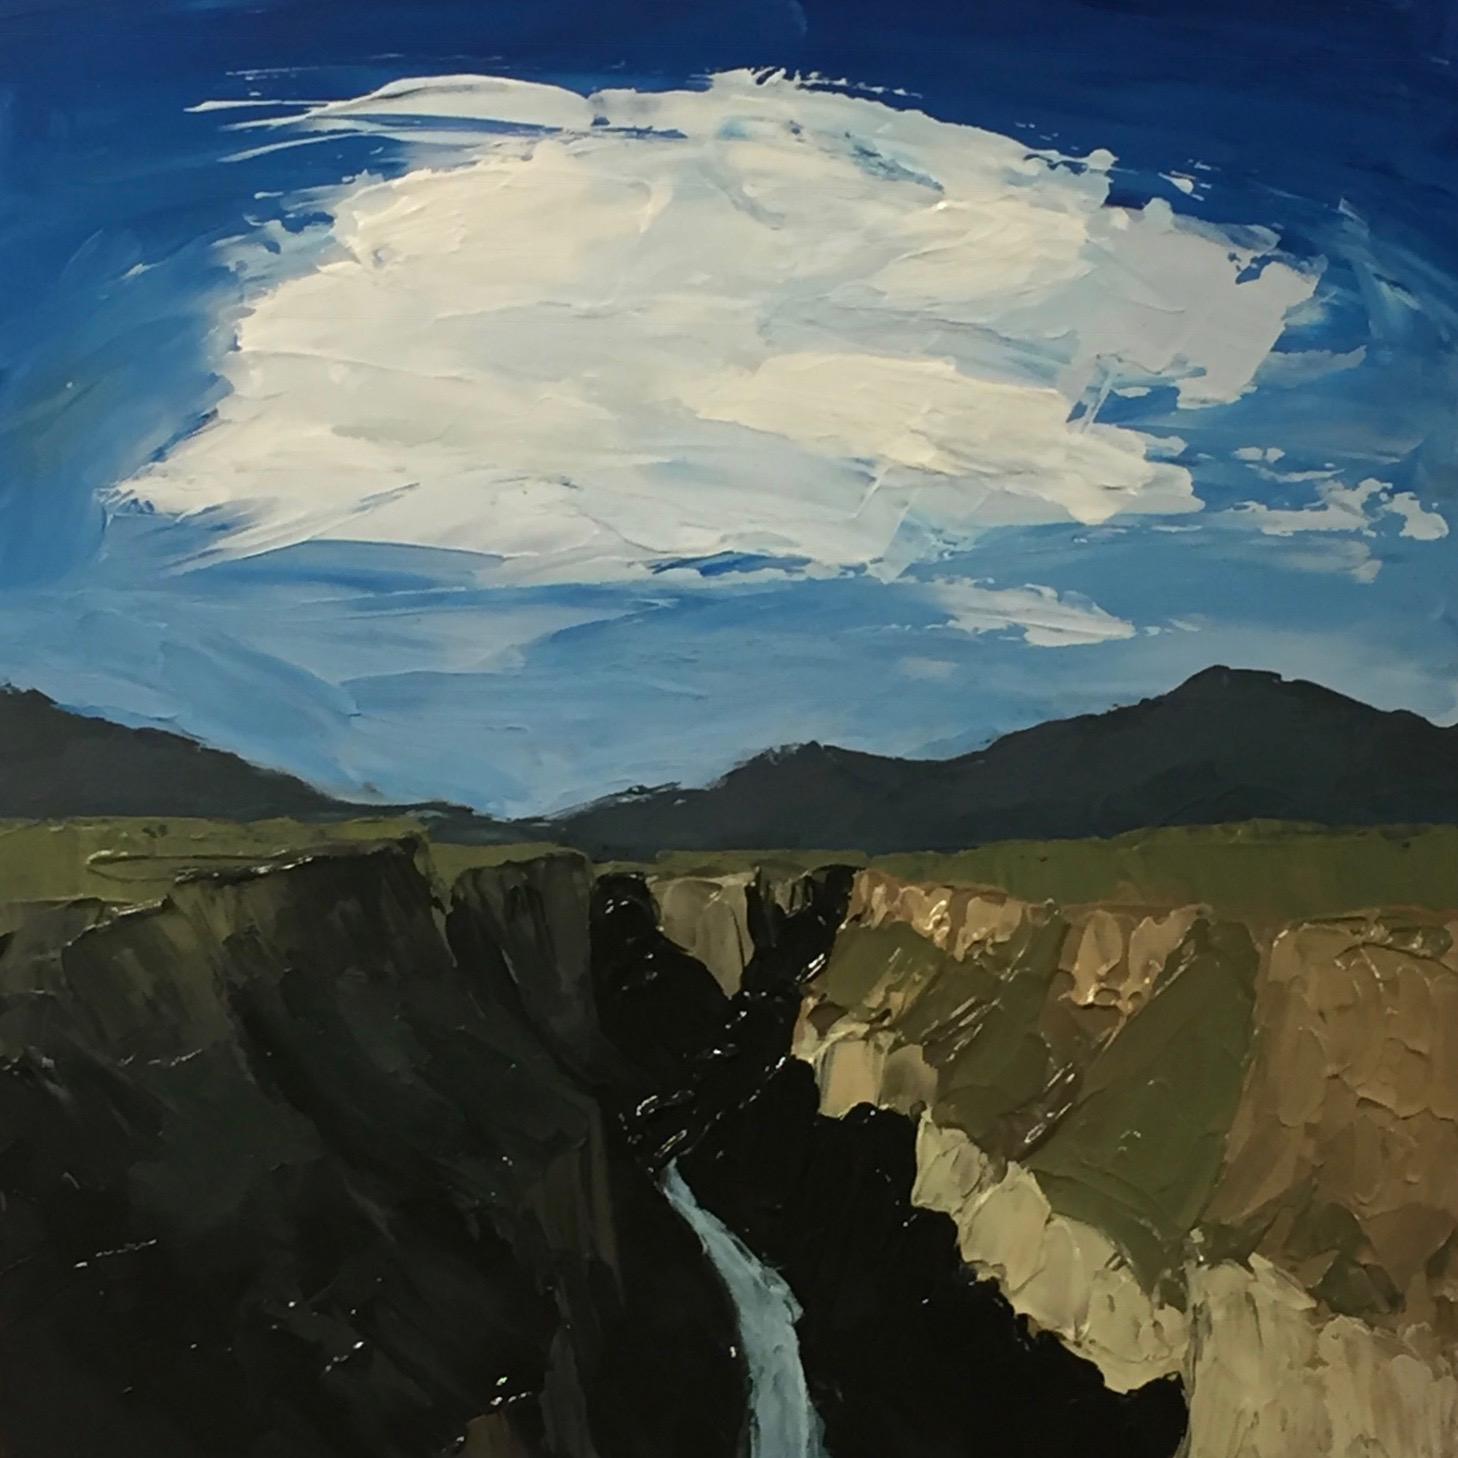 Taos No. 2